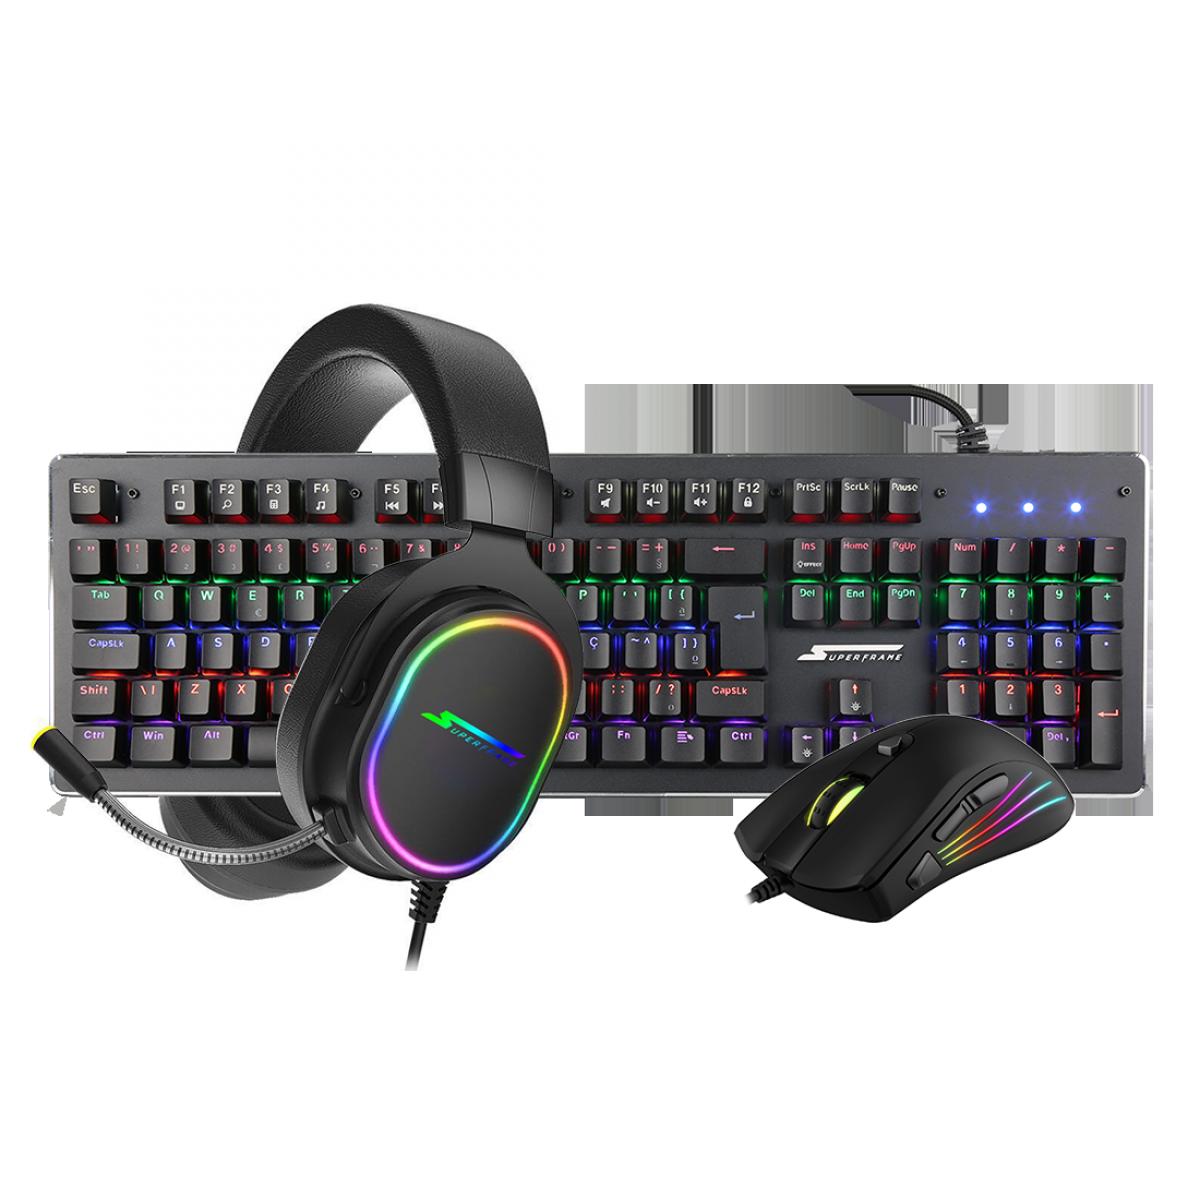 Combo Gamer SuperFrame, Teclado Mecânico Player 1 + Mouse Gamer Big Boss + Headset Gamer Velka